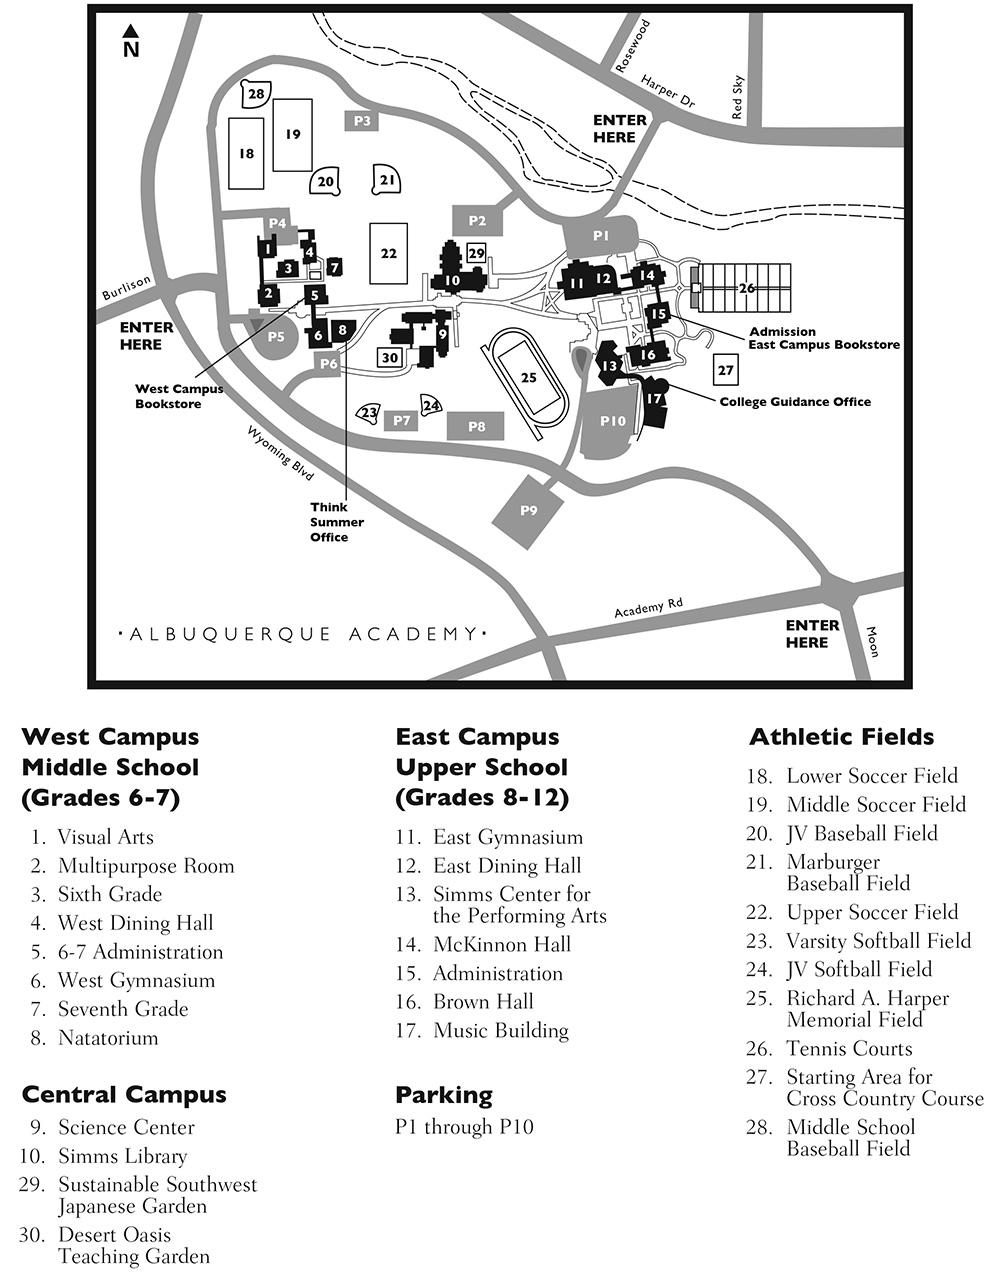 CampusMap_7-1-2015